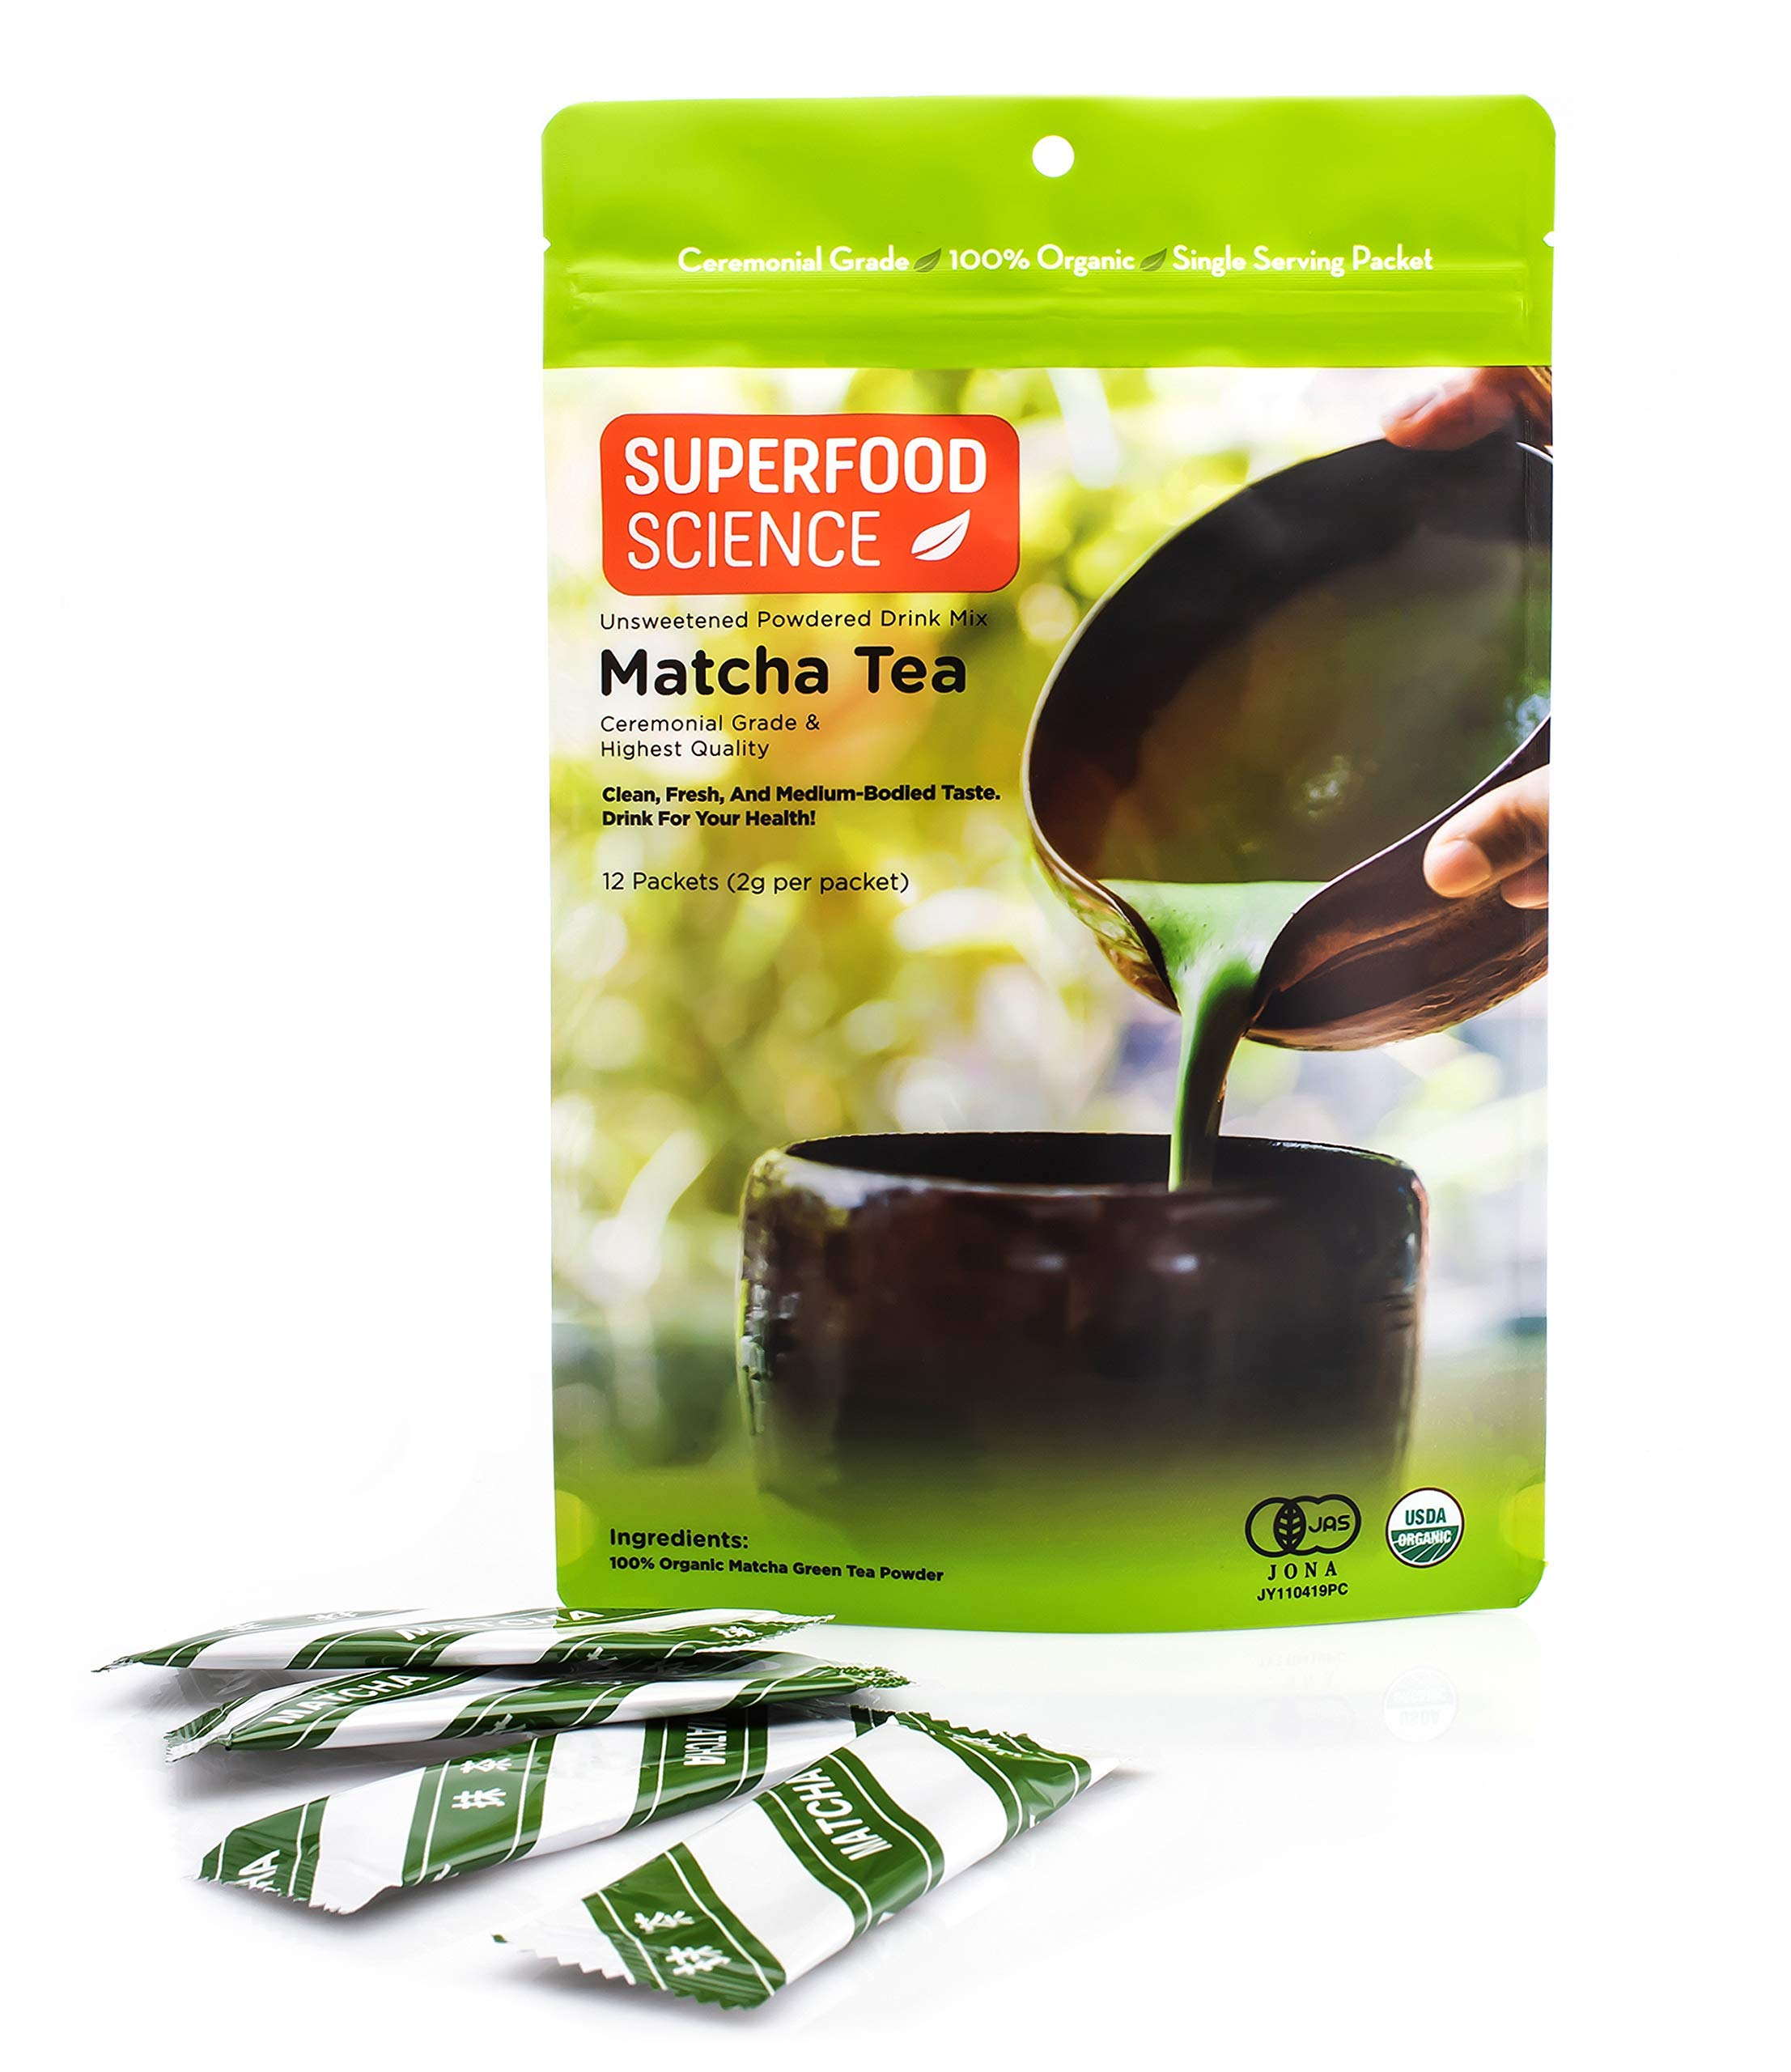 Superfood Science Matcha Green Tea Powder, Authentic Japanese Ceremonial Grade Matcha, USDA Organic, 12 Single Serve Stick Packs